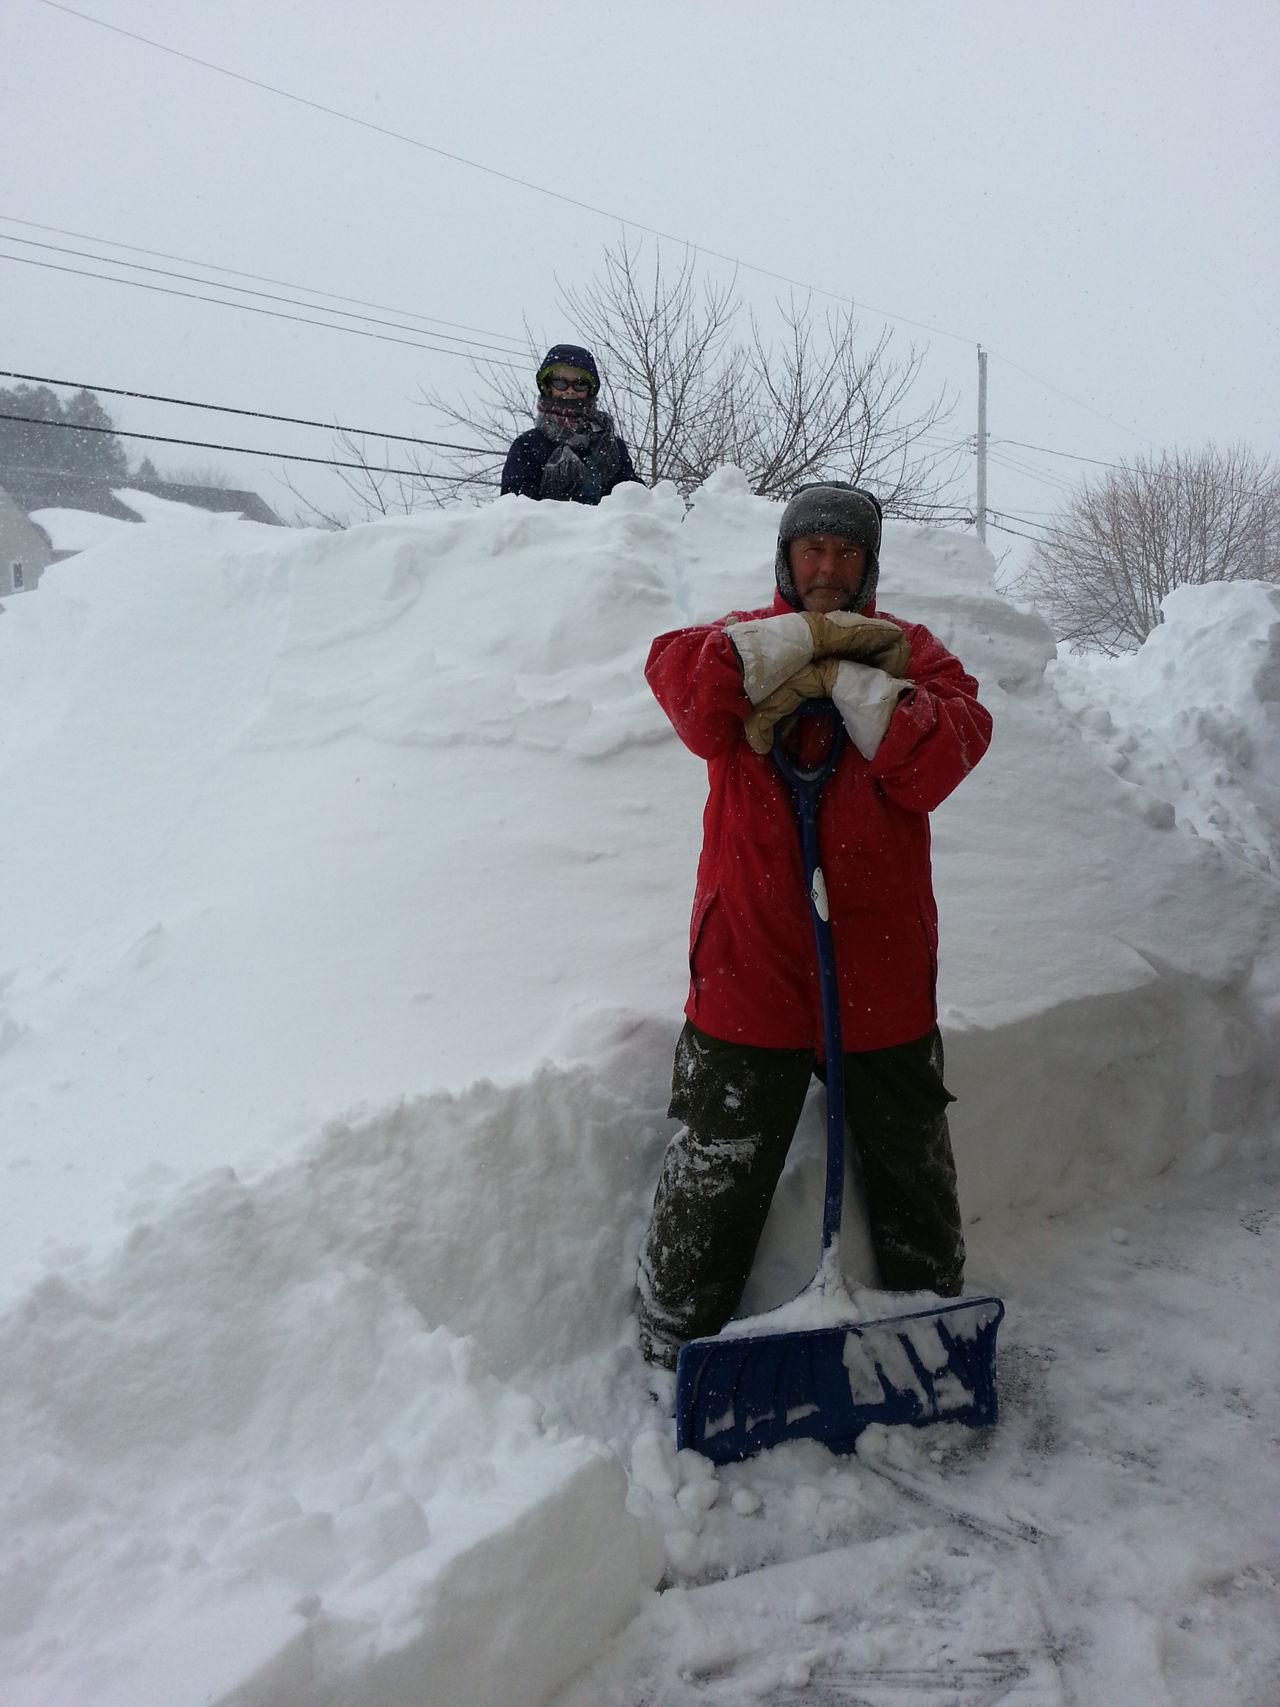 Poweroutage Winter Wintertime ⛄ Winter Morning EyeEmNewHere Snow Snow ❄ Shovelling Childhood Memories Snow Storm Manvsnature  Man Versus Nature Man Vs Nature